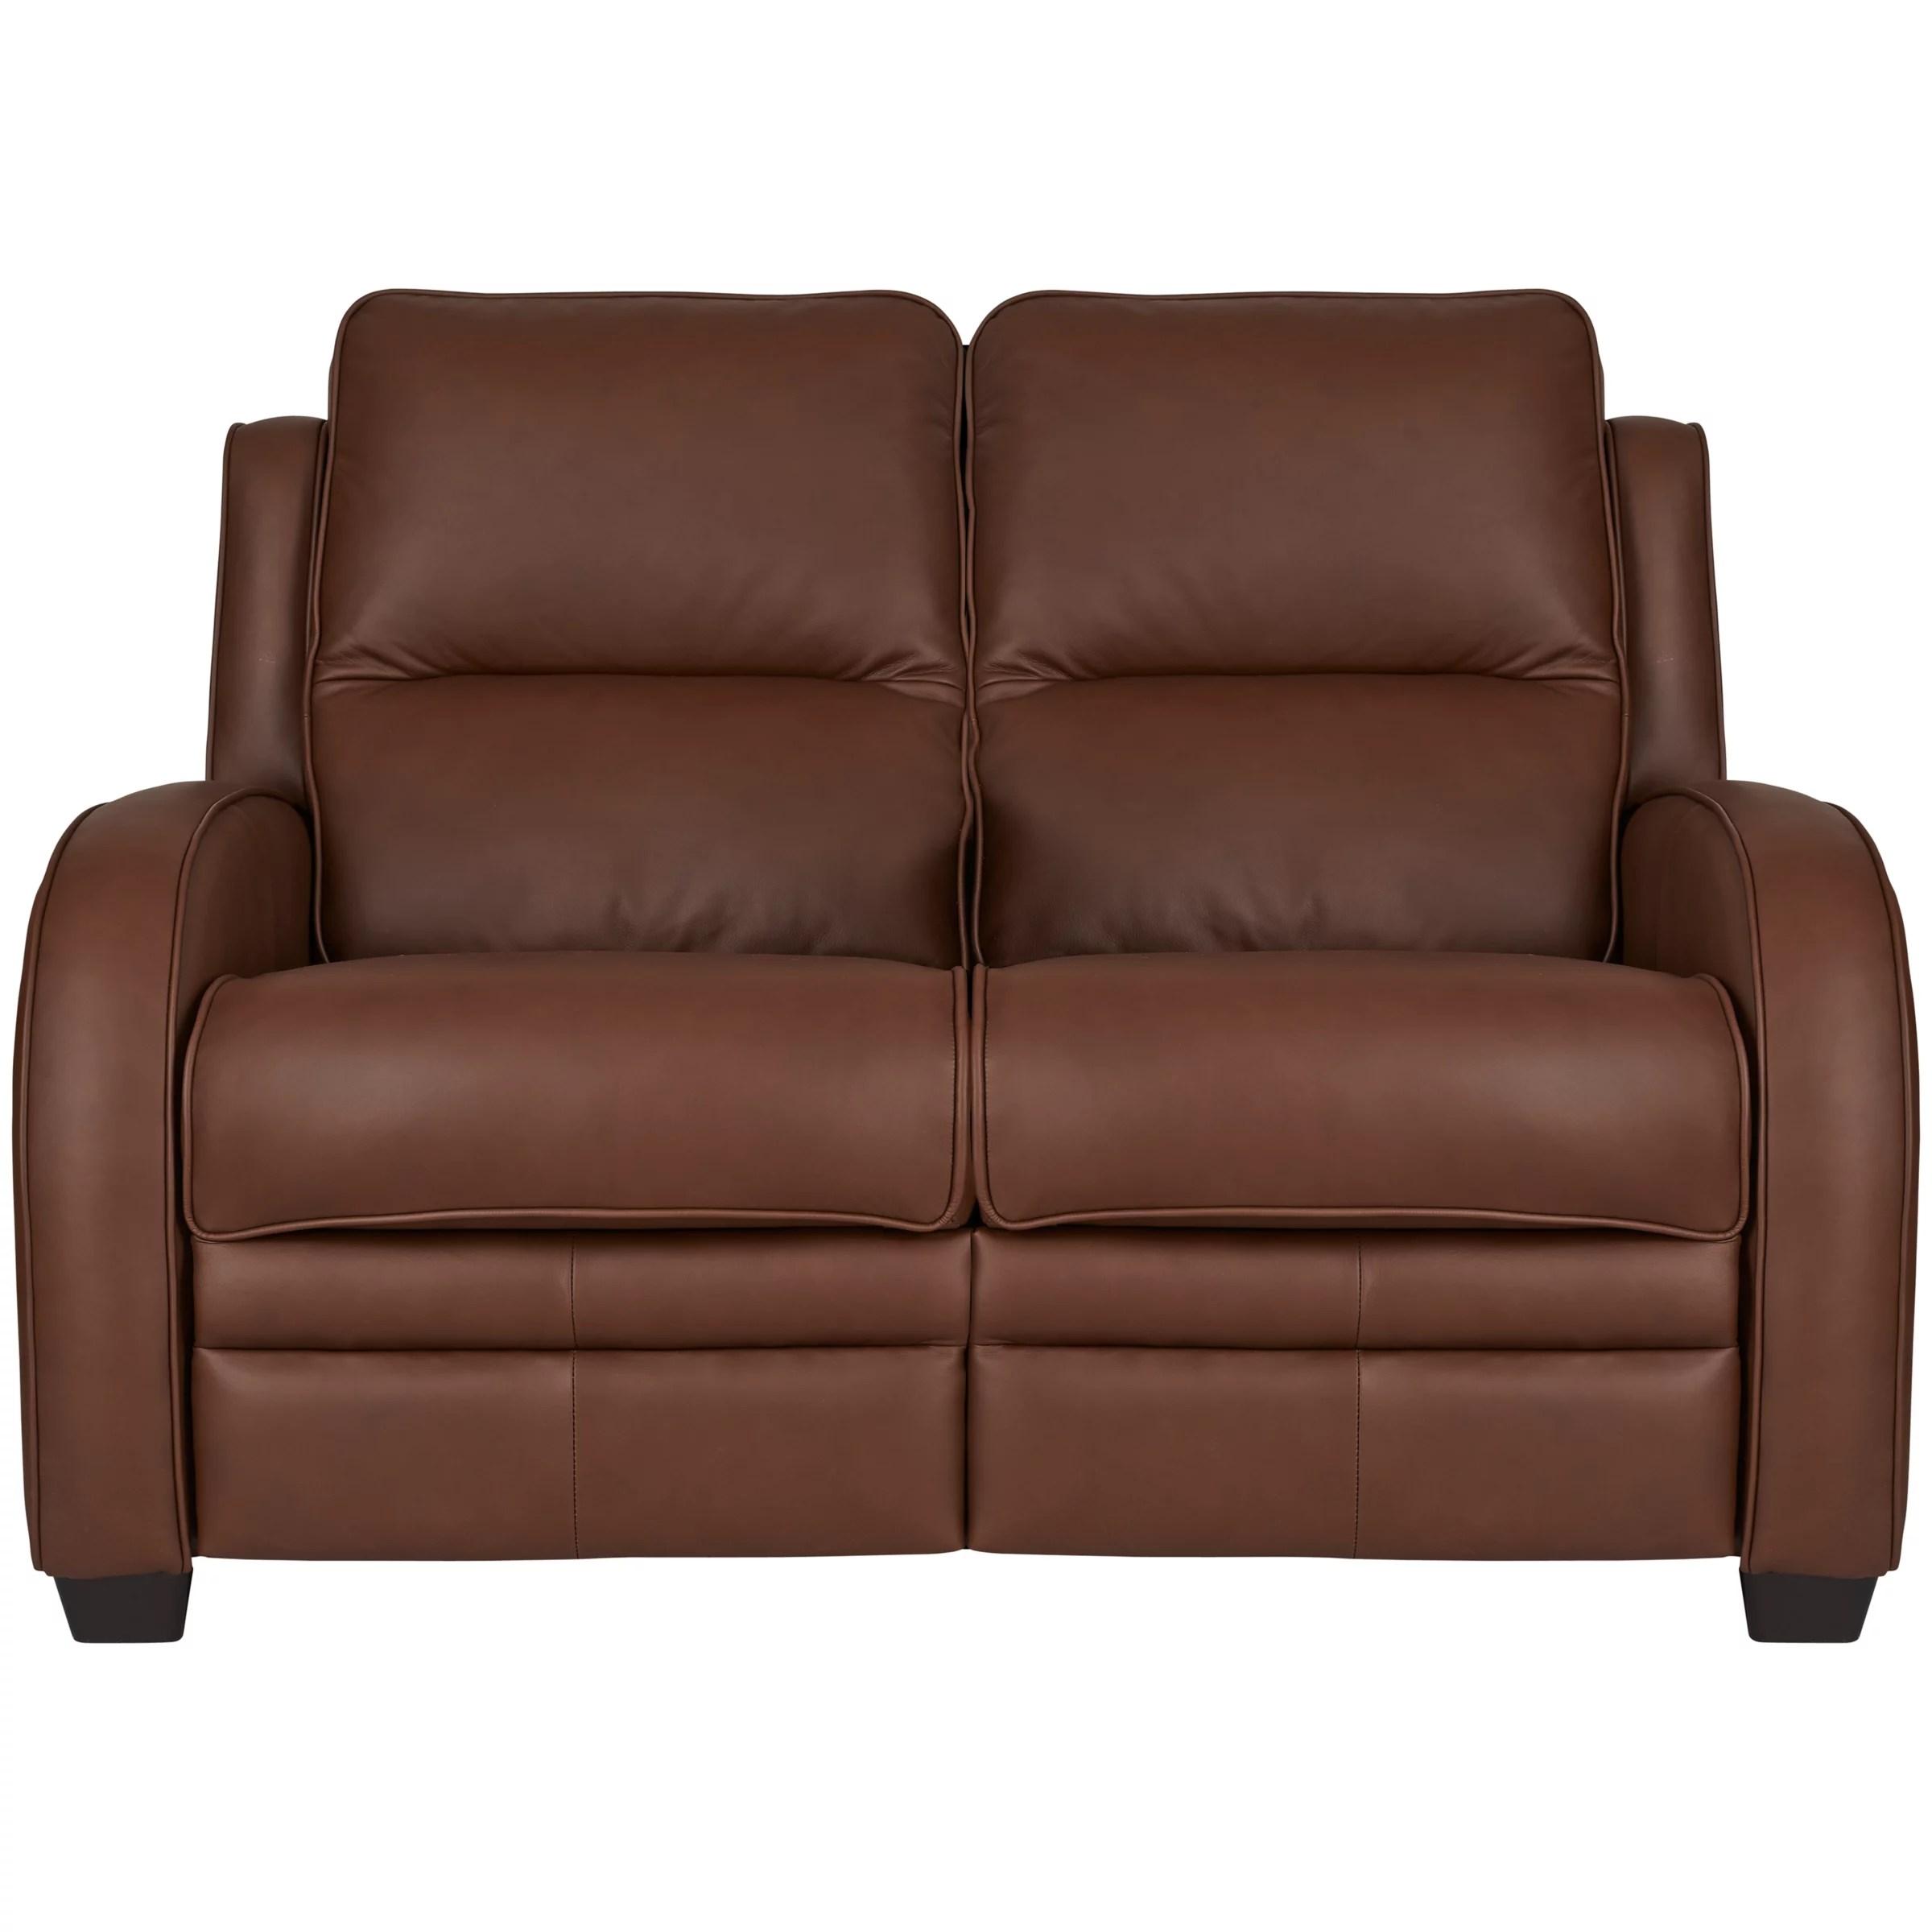 leather sofa repair charleston sc penny mustard bed aniline top grain full sofas